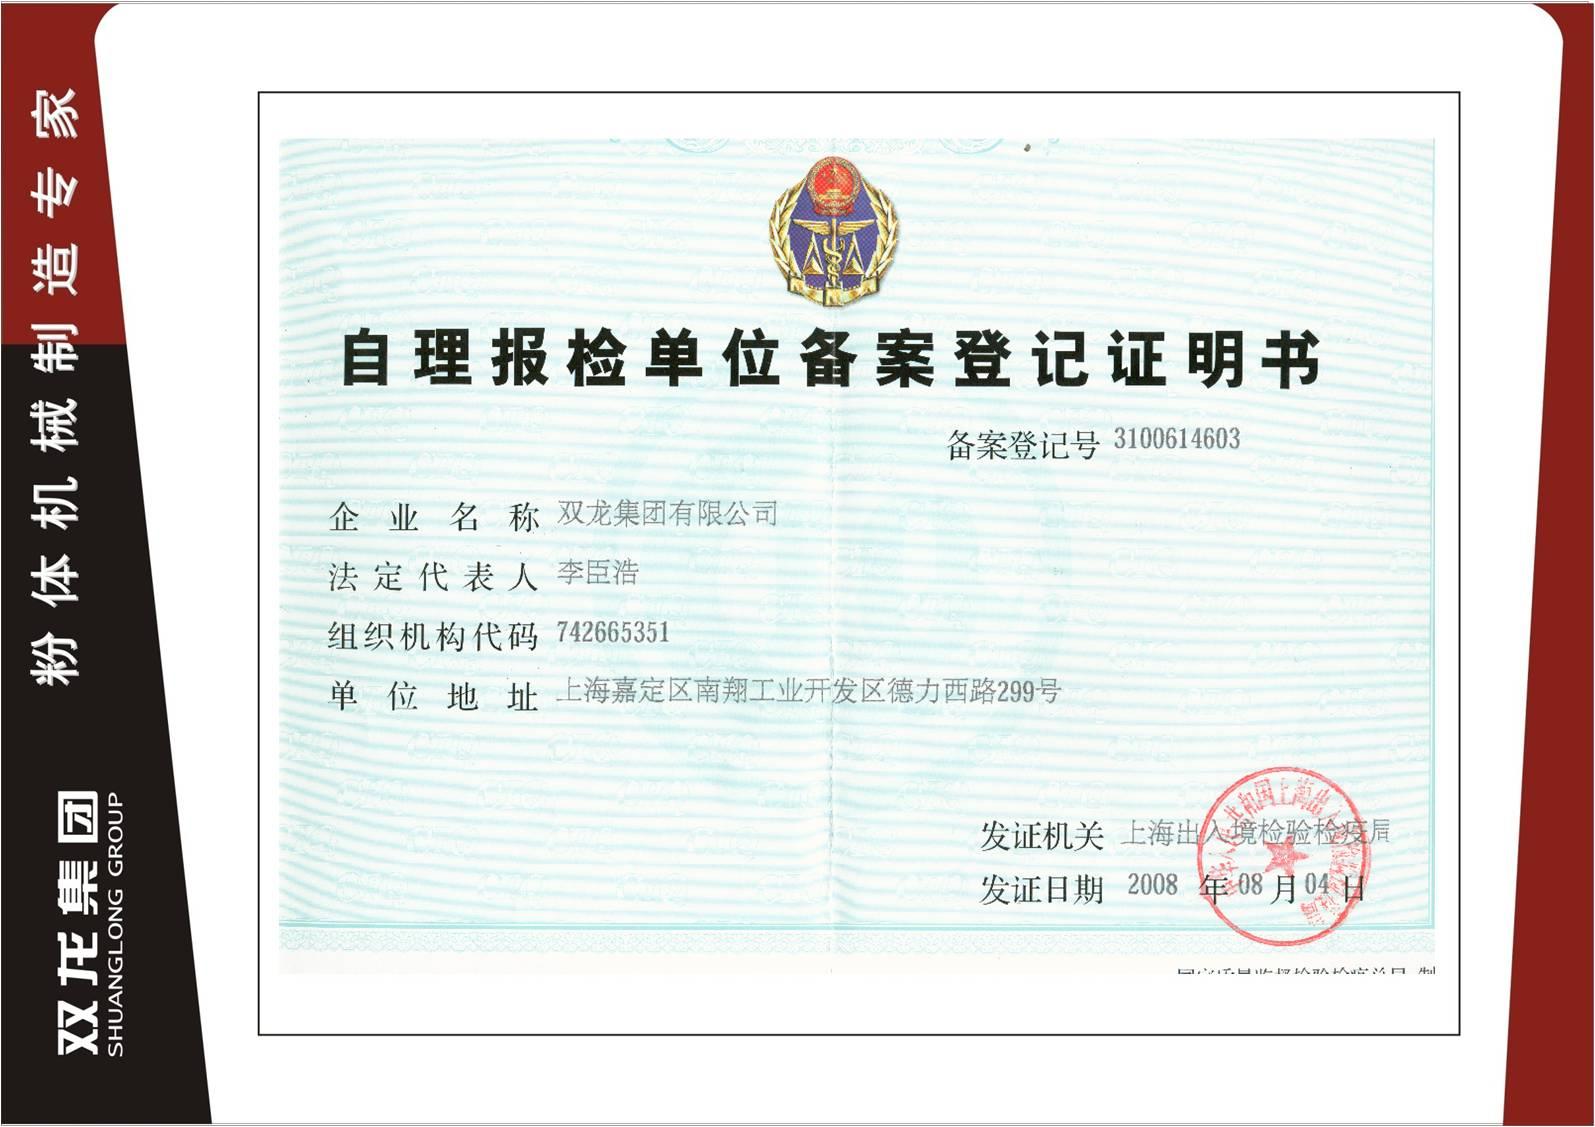 Self-care Inspection and Quarantine Declaration Registration Certificate